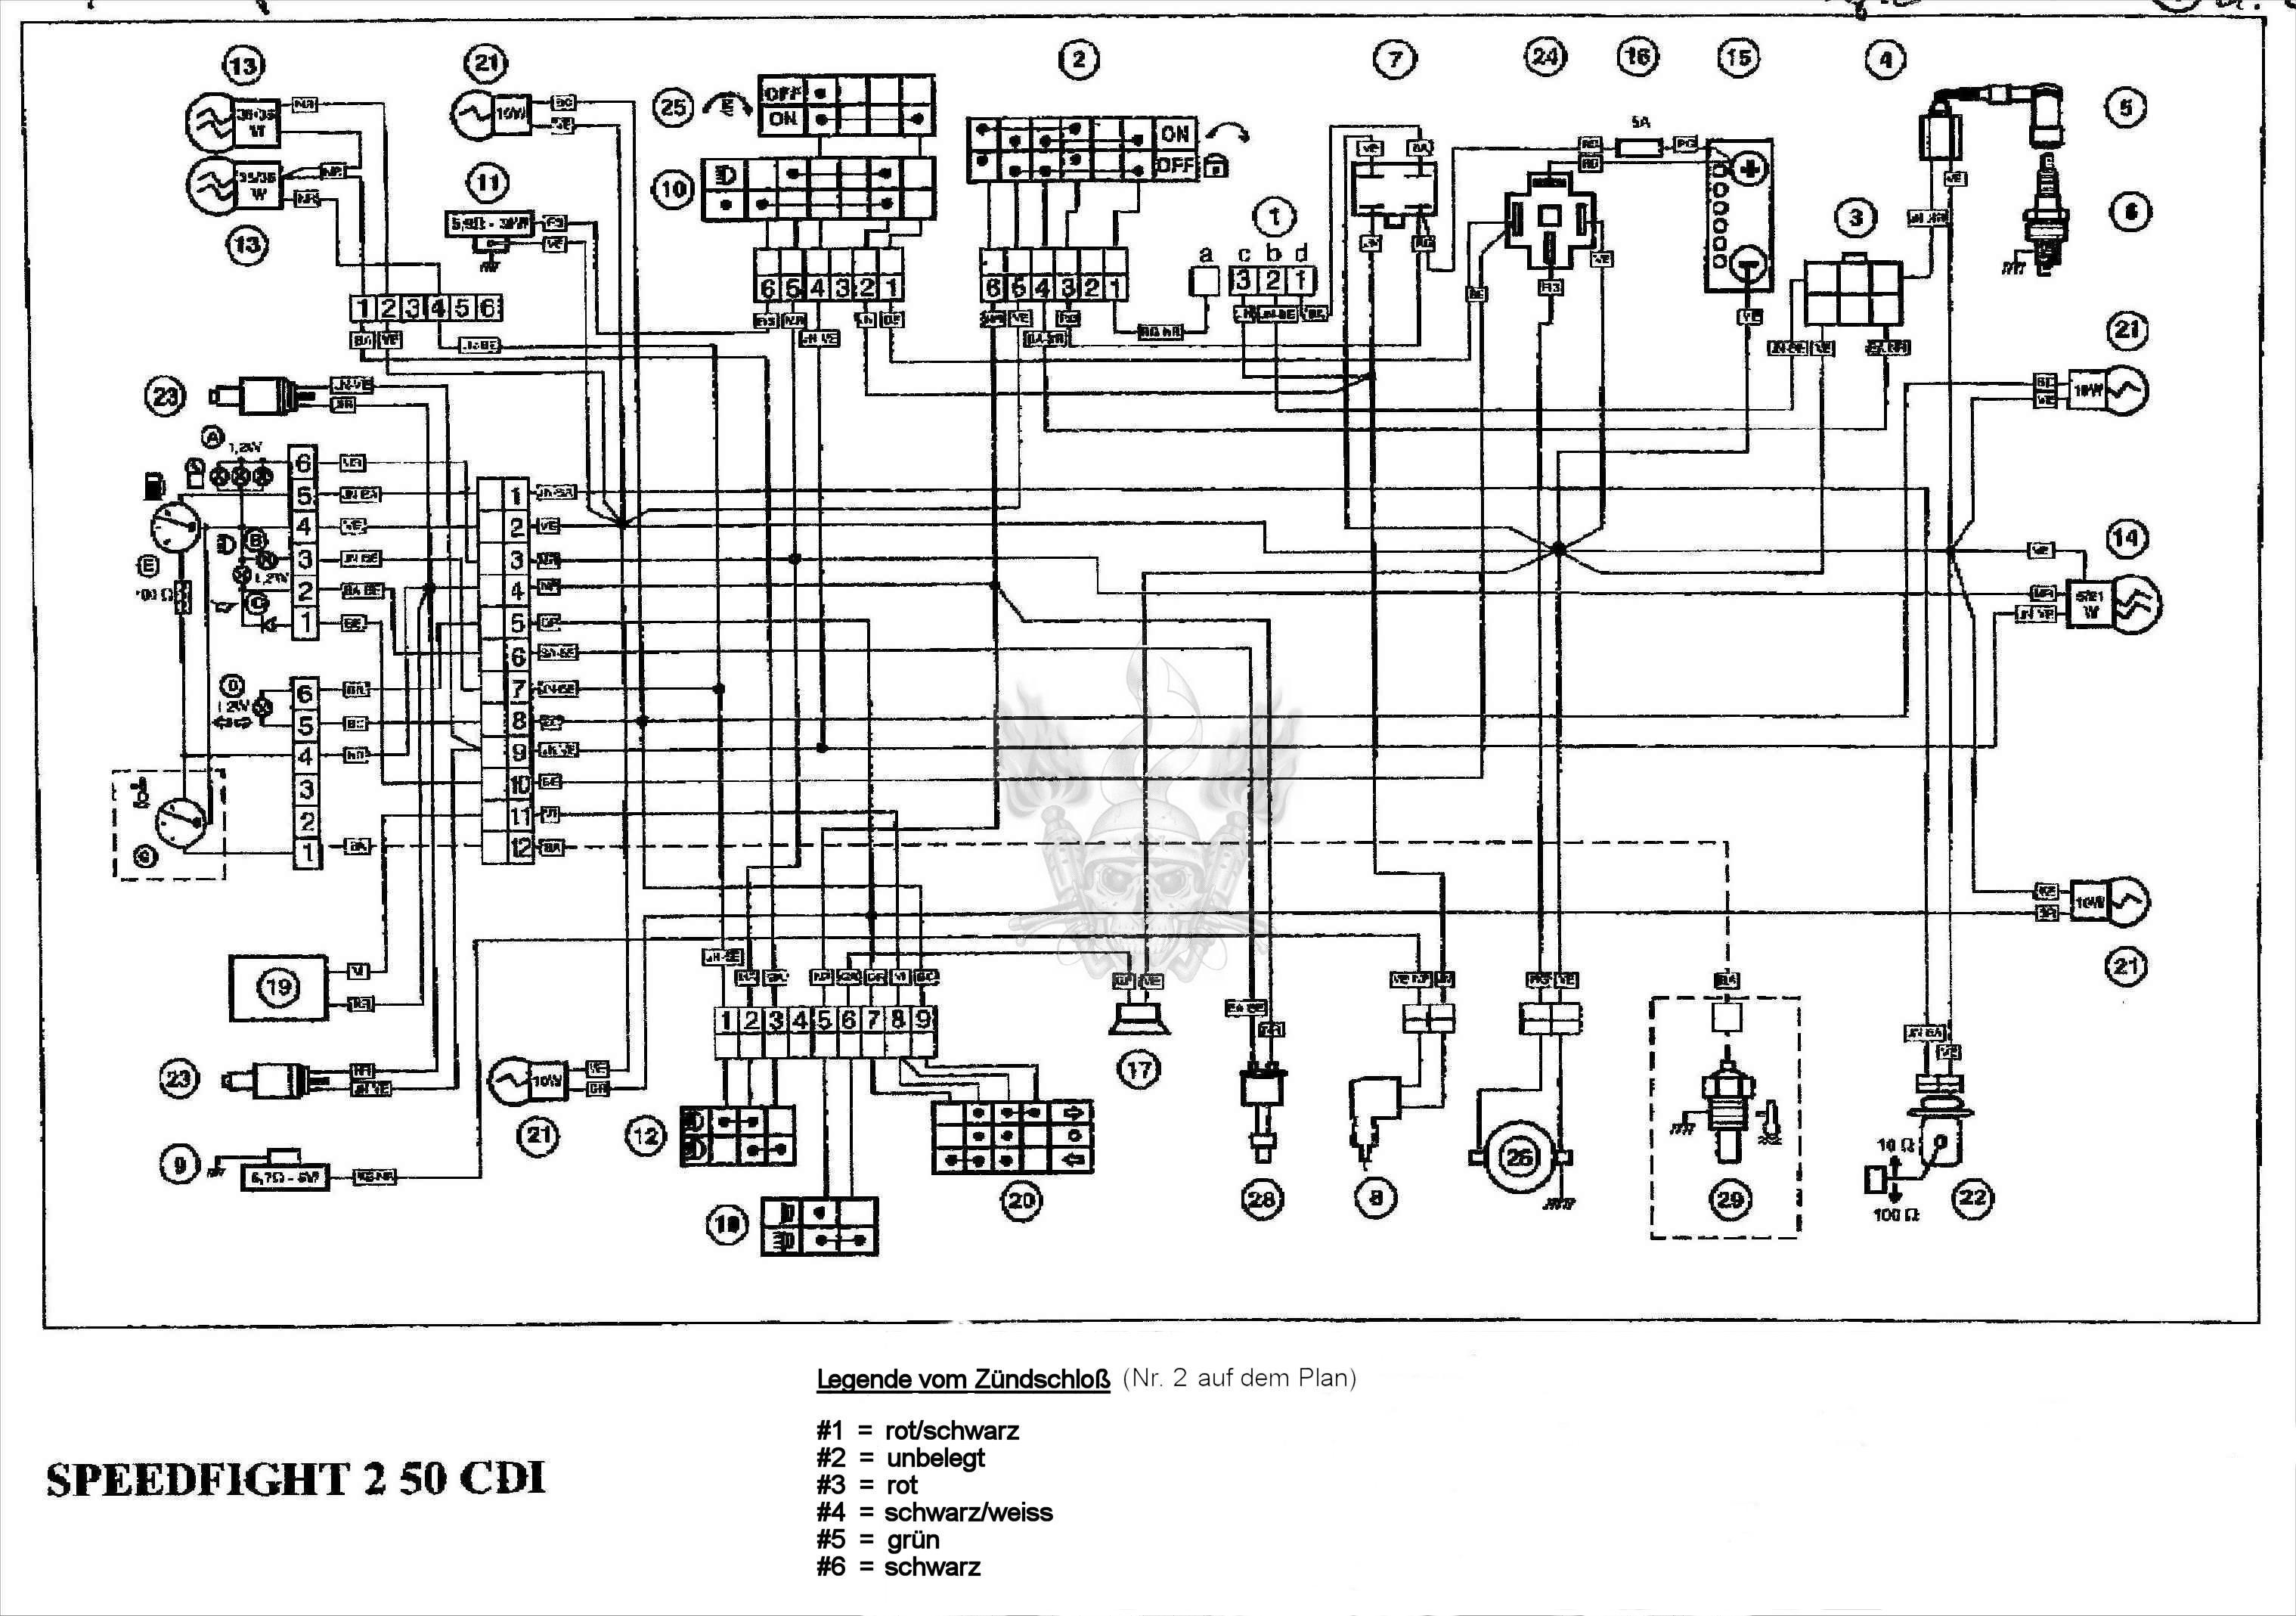 ducati charging system ducati wiring diagram rotax ducati charging